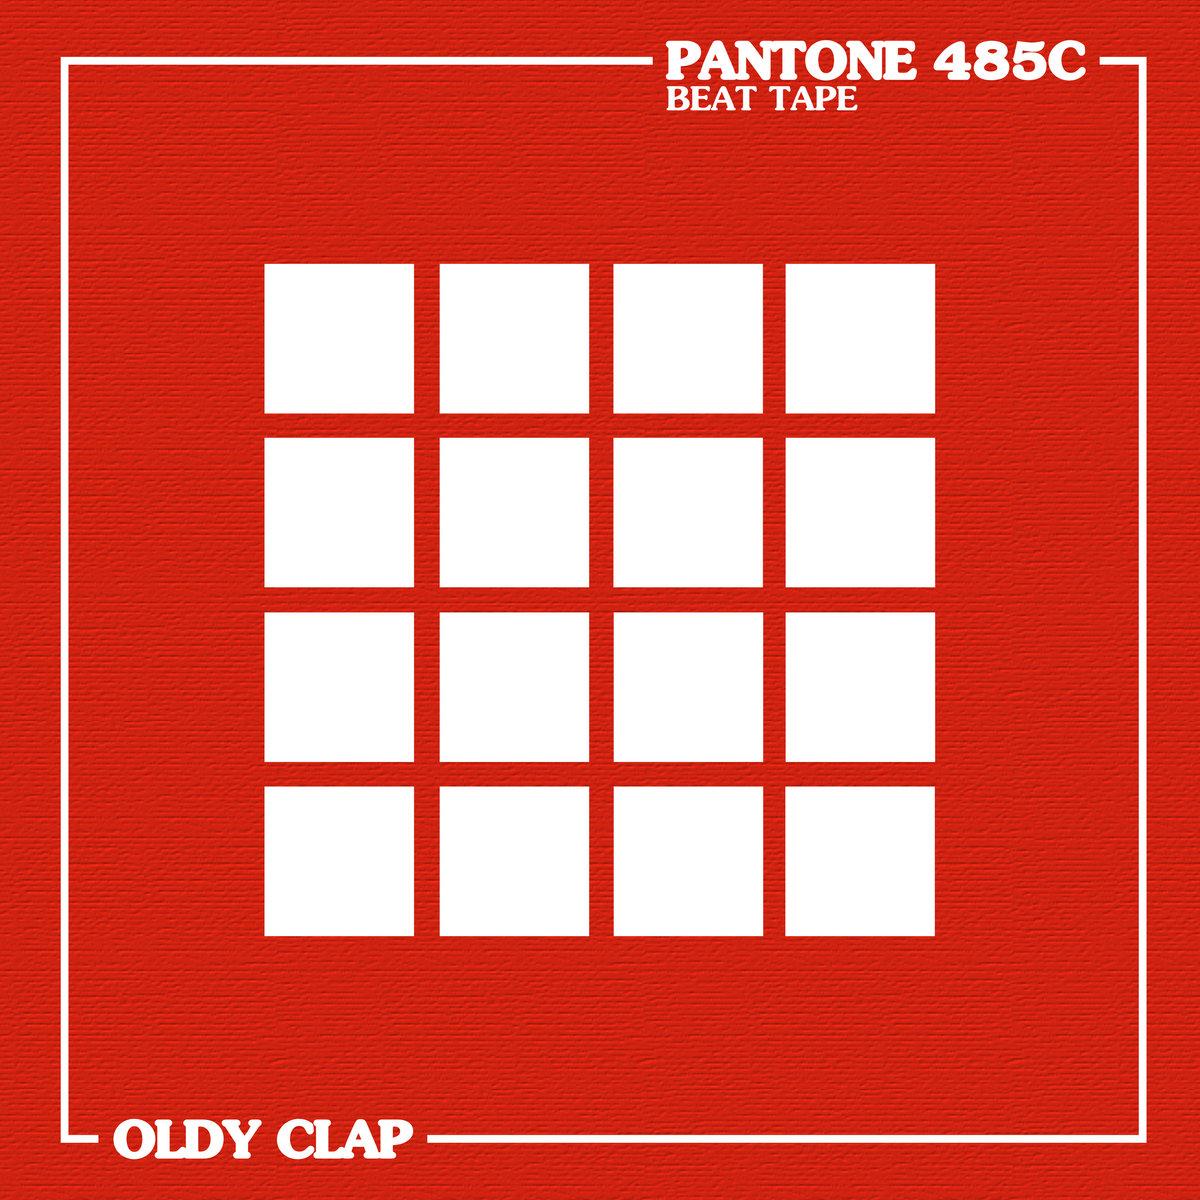 PANTONE 485C | Oldy Clap